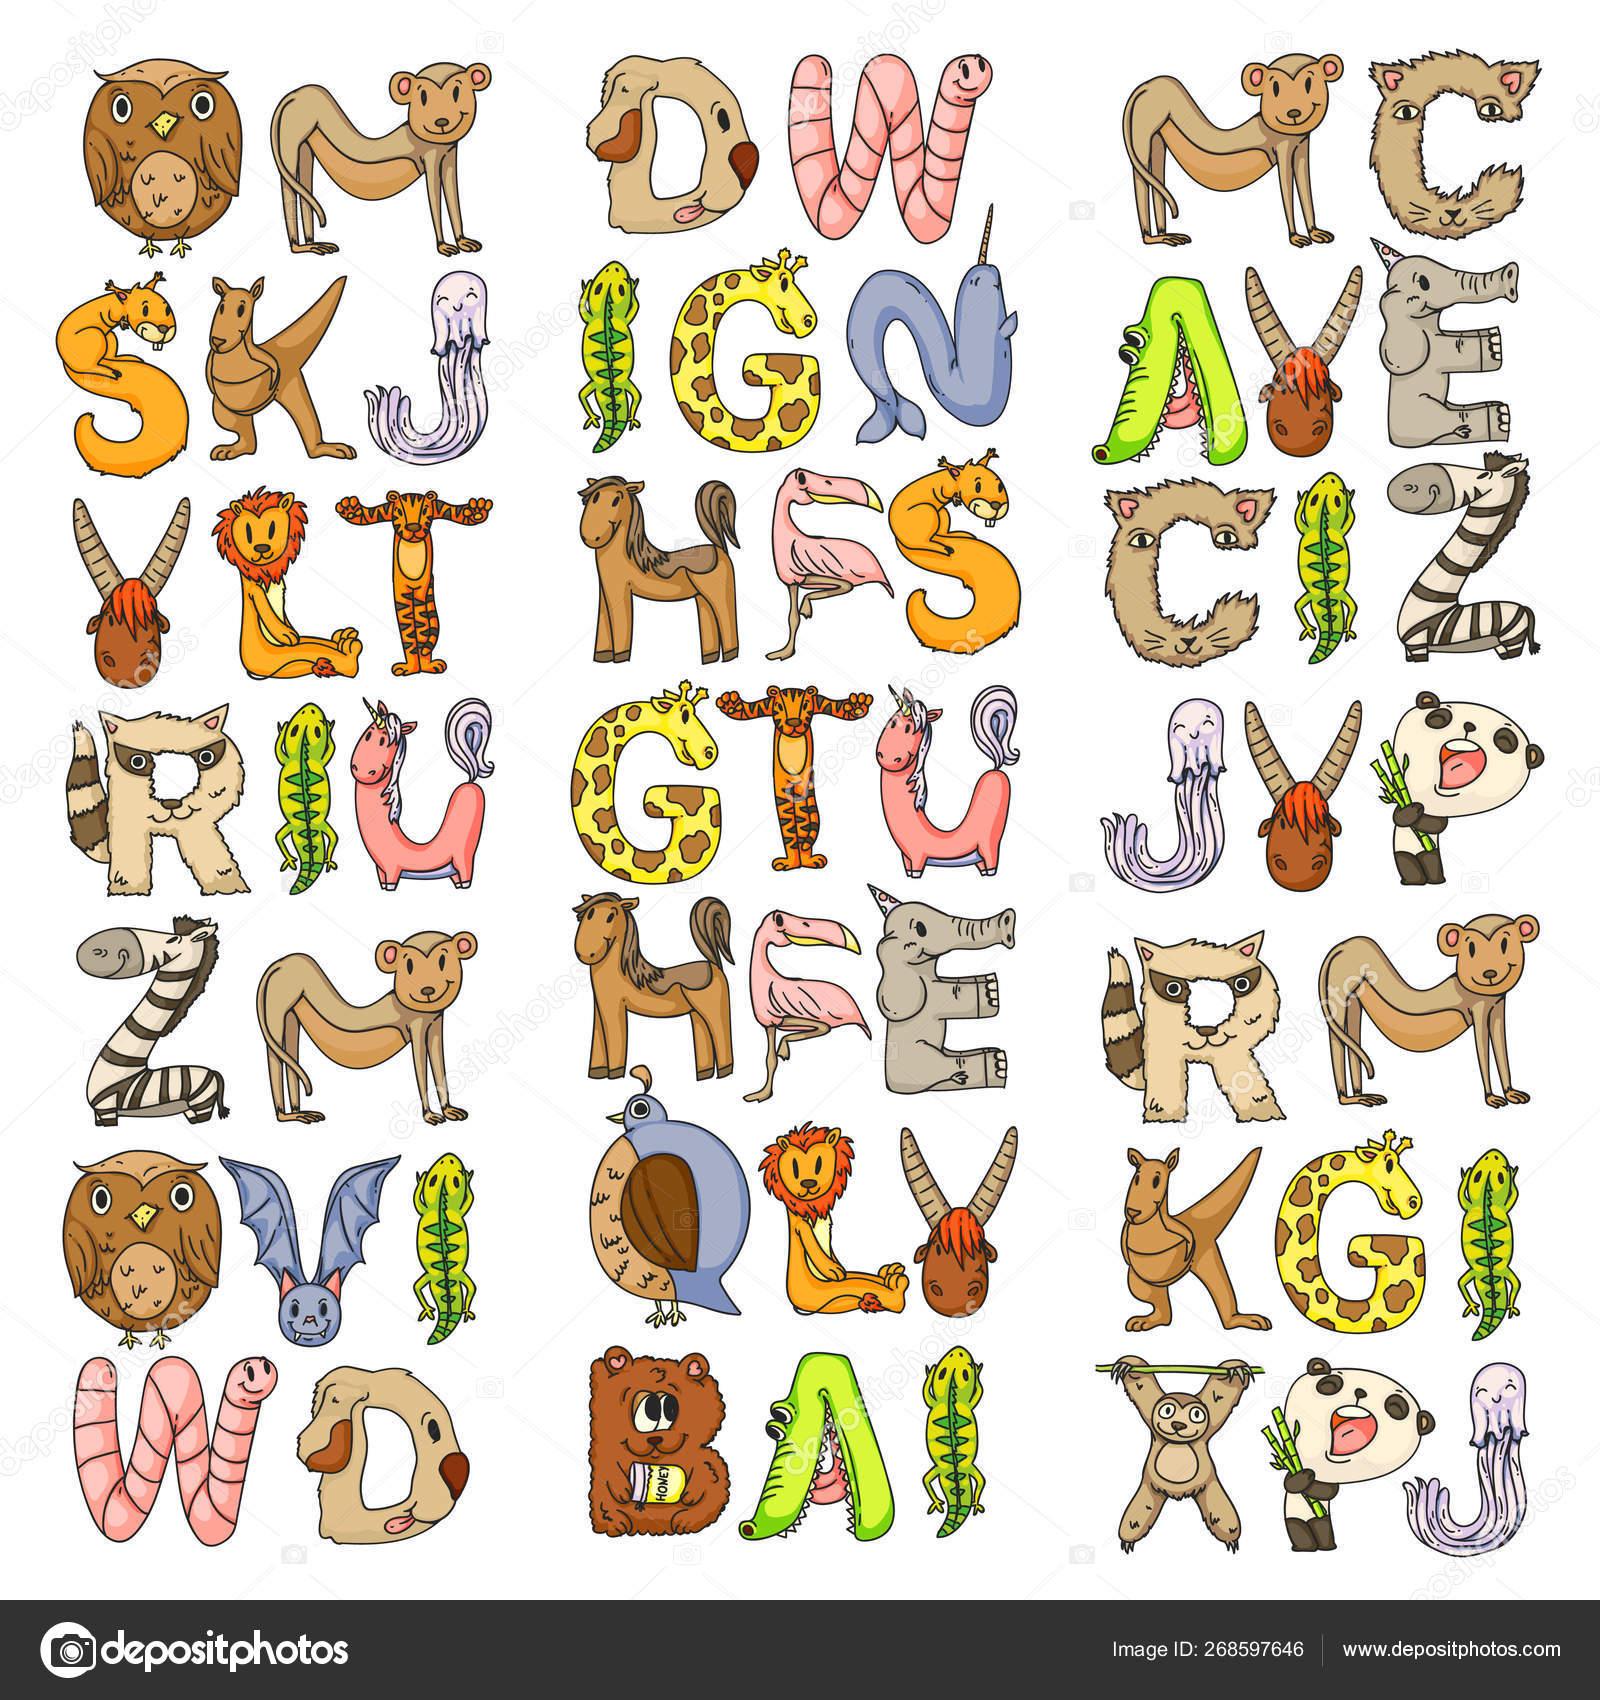 Animal alphabet  Letters from A to Z  Flamingo, giraffe